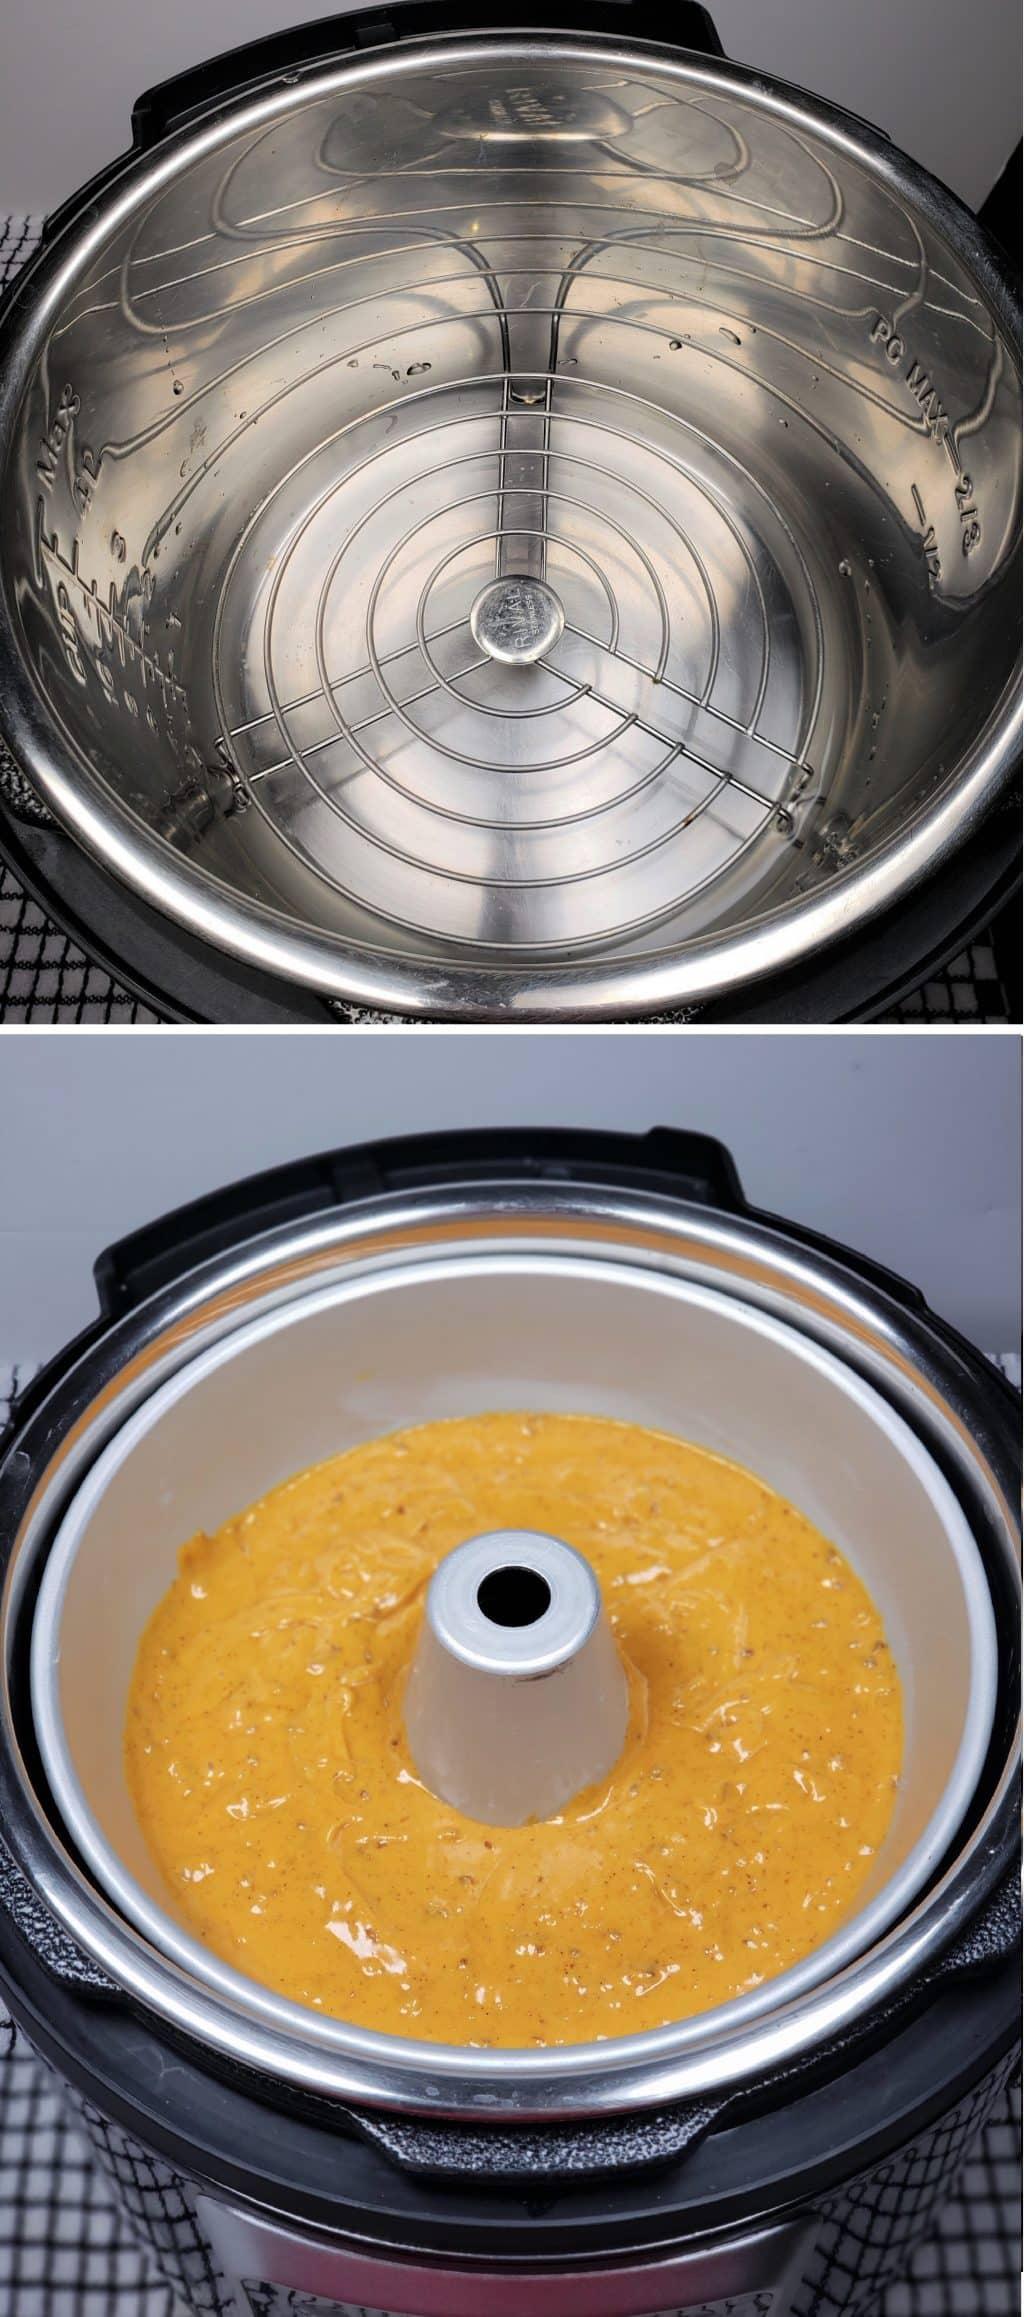 Water, Trivet and Cake Pan in Cooking Pot